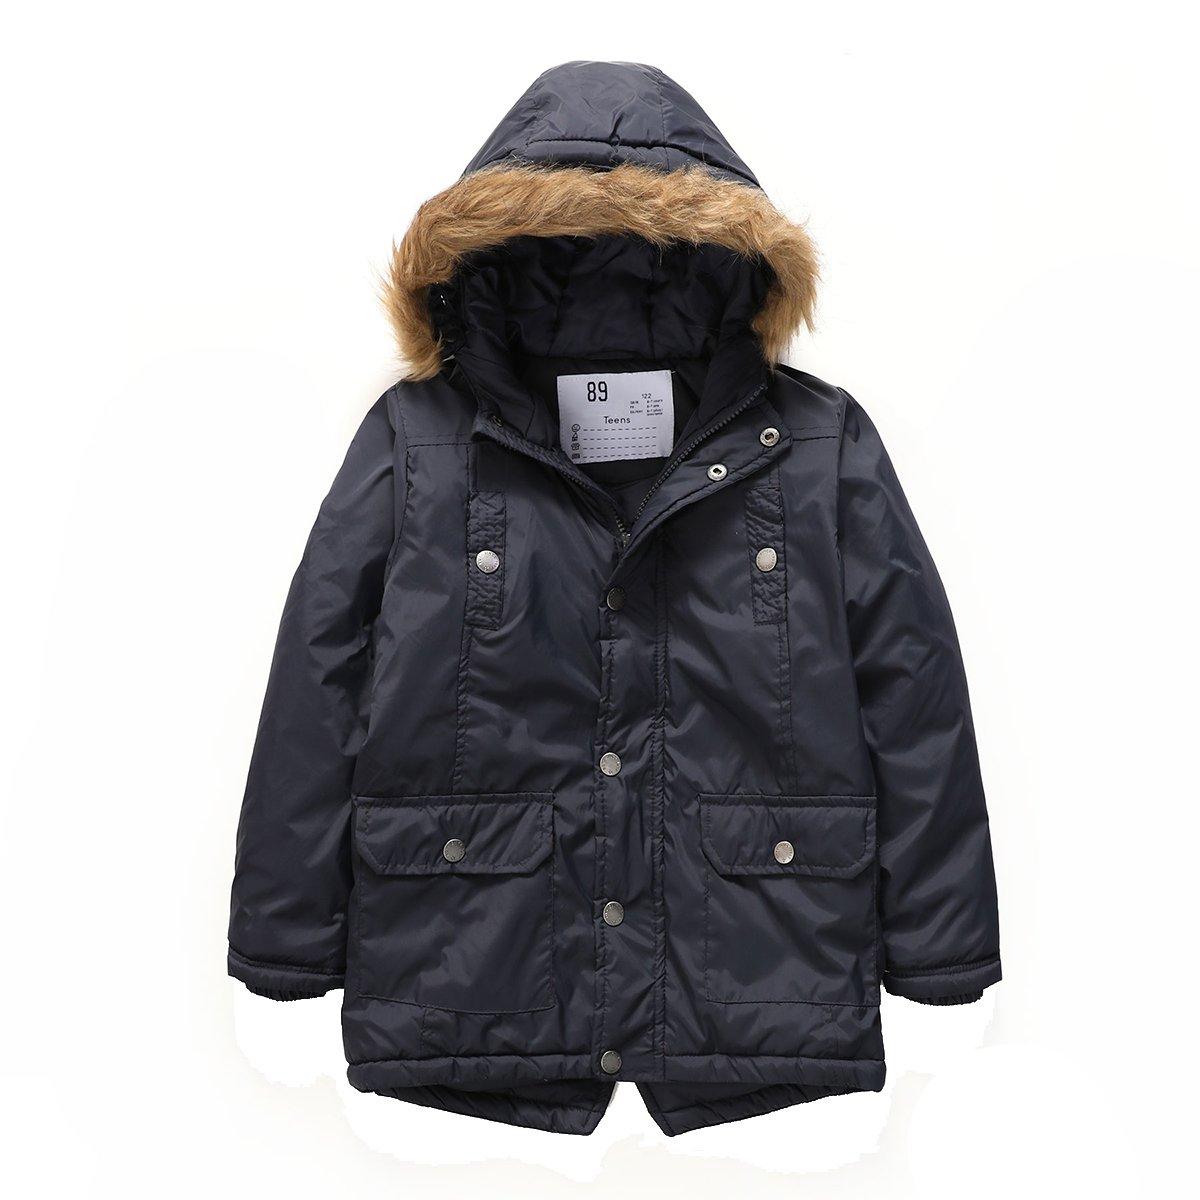 PHIBEE Boys' Winter Windproof Cotton Faux Fur Hooded Parka Jacket